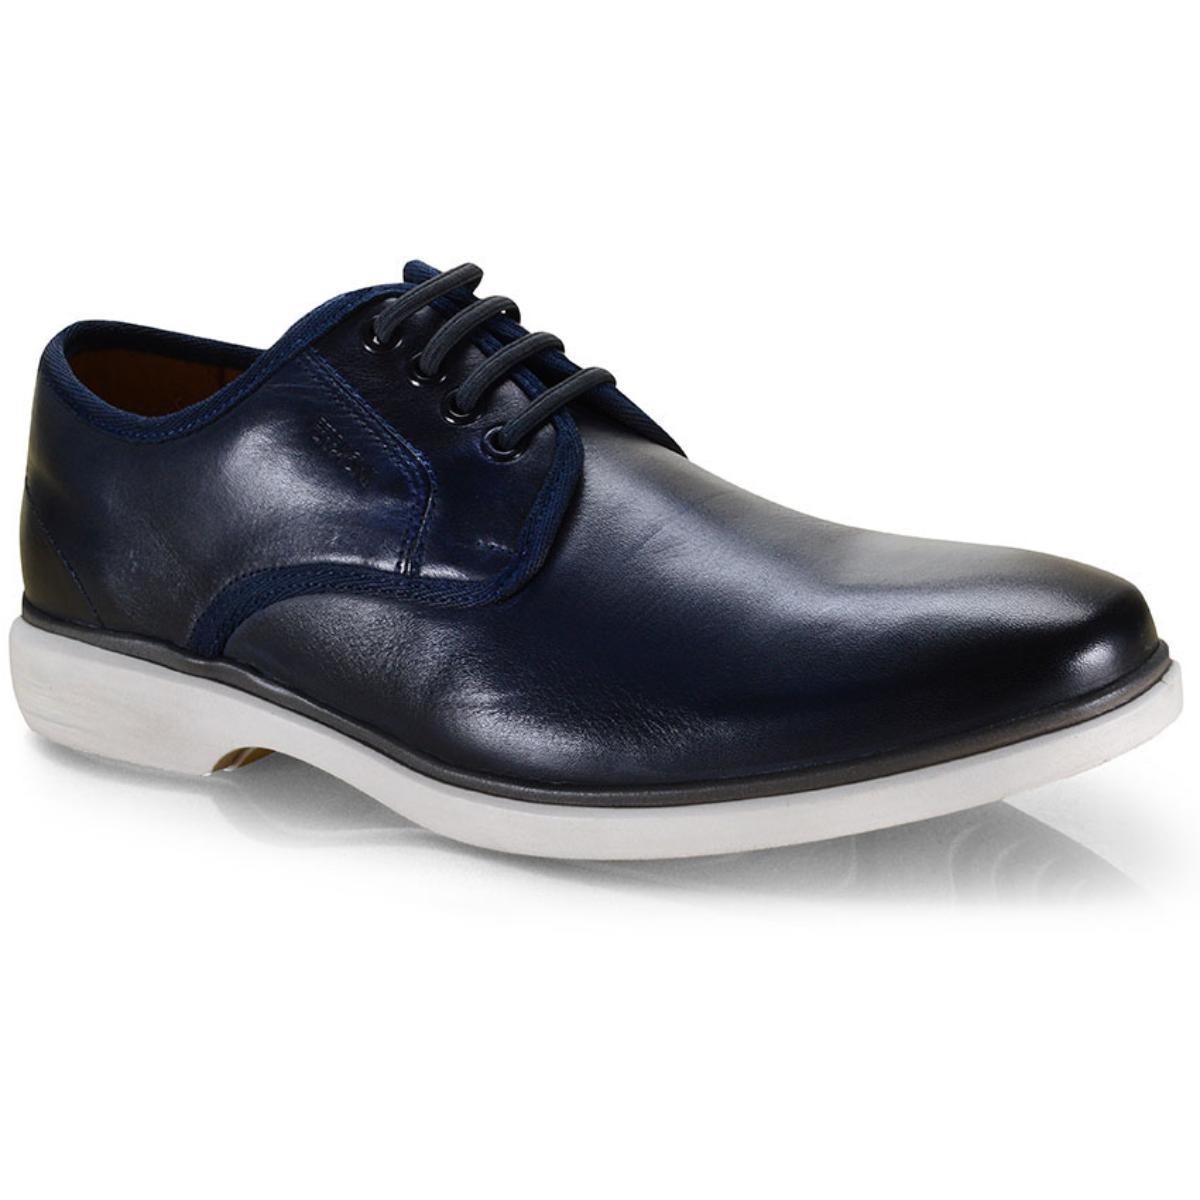 Sapato Masculino Ferracini 6741-582i Marinho